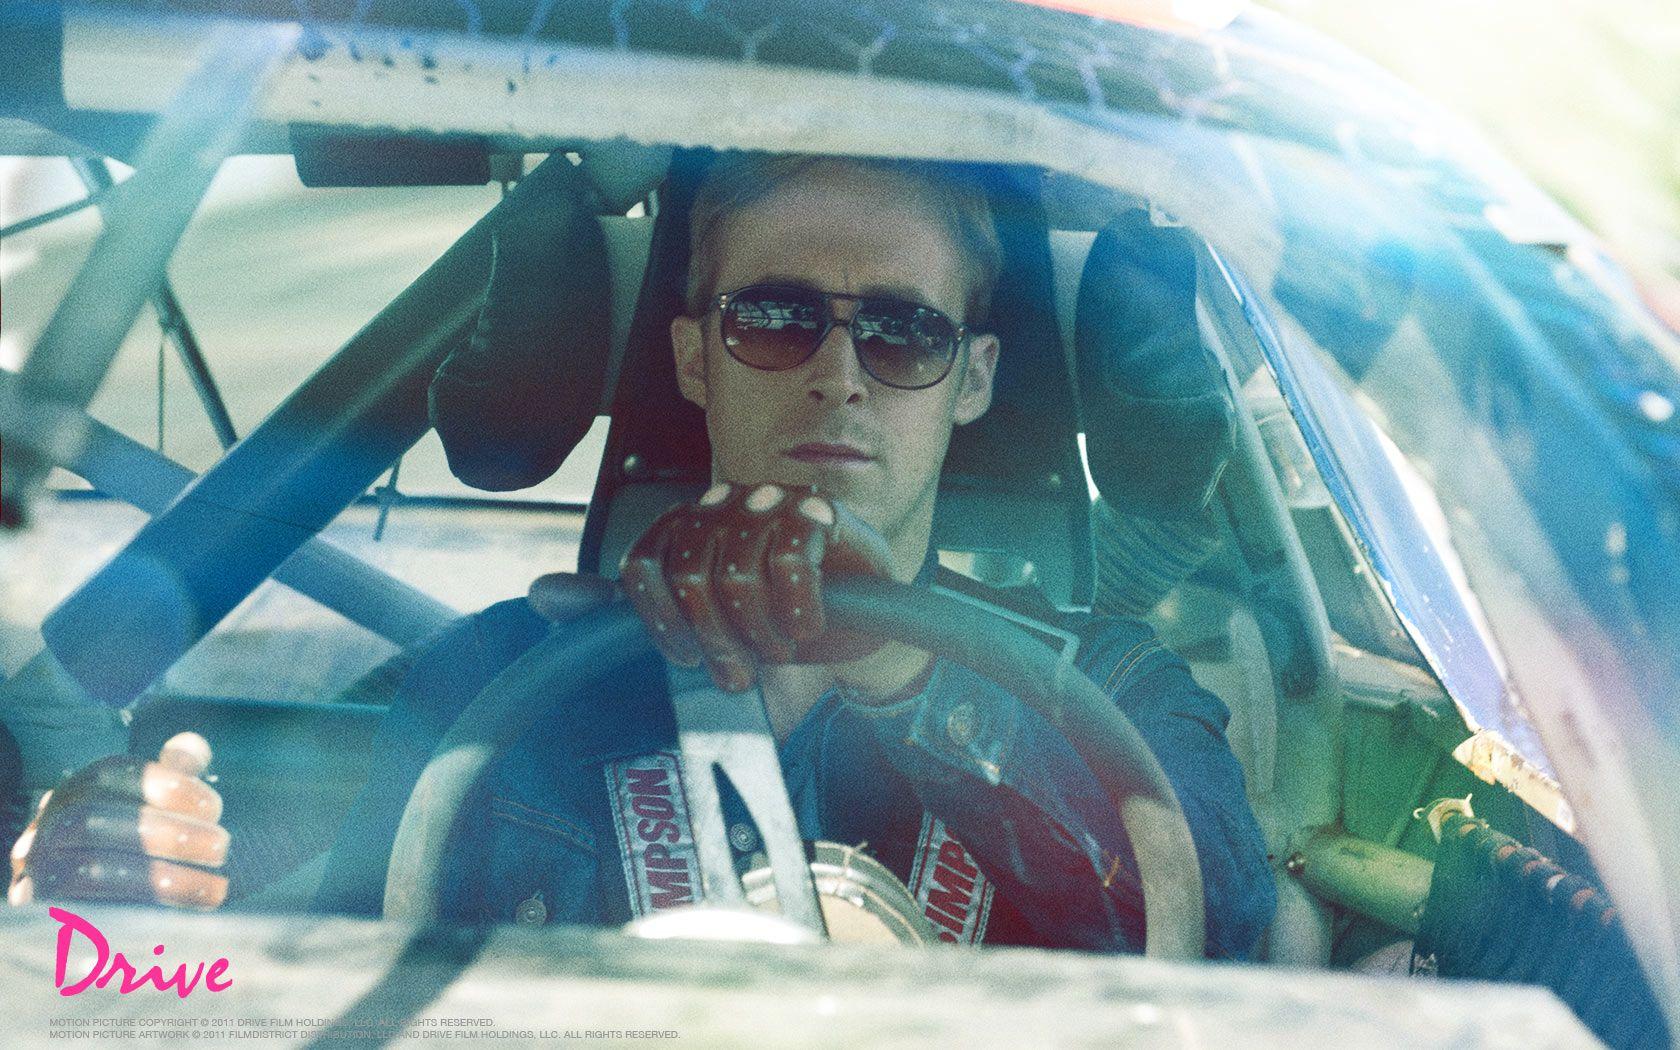 Driving gloves like ryan gosling - Movies Sunglasses Ryan Gosling Drive Movie 1680x1050 Wallpaper